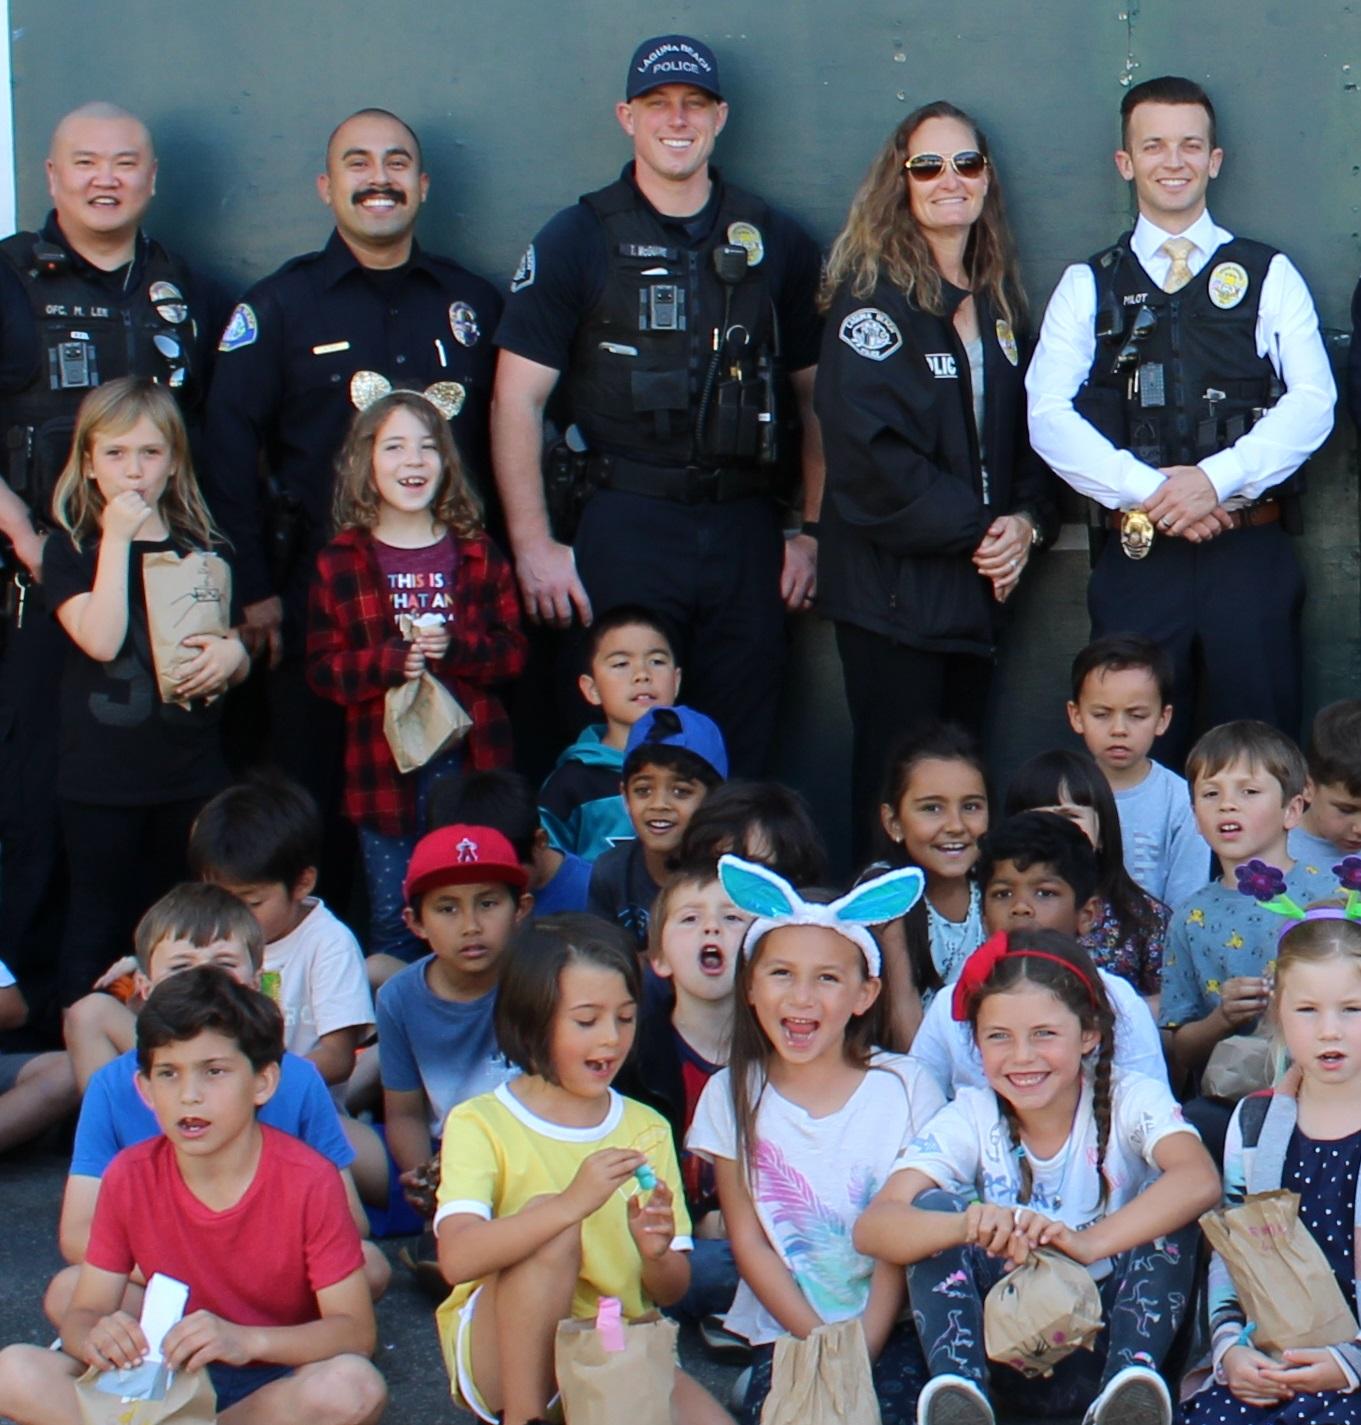 Lagun Beach Police Department Group Volunteer Day